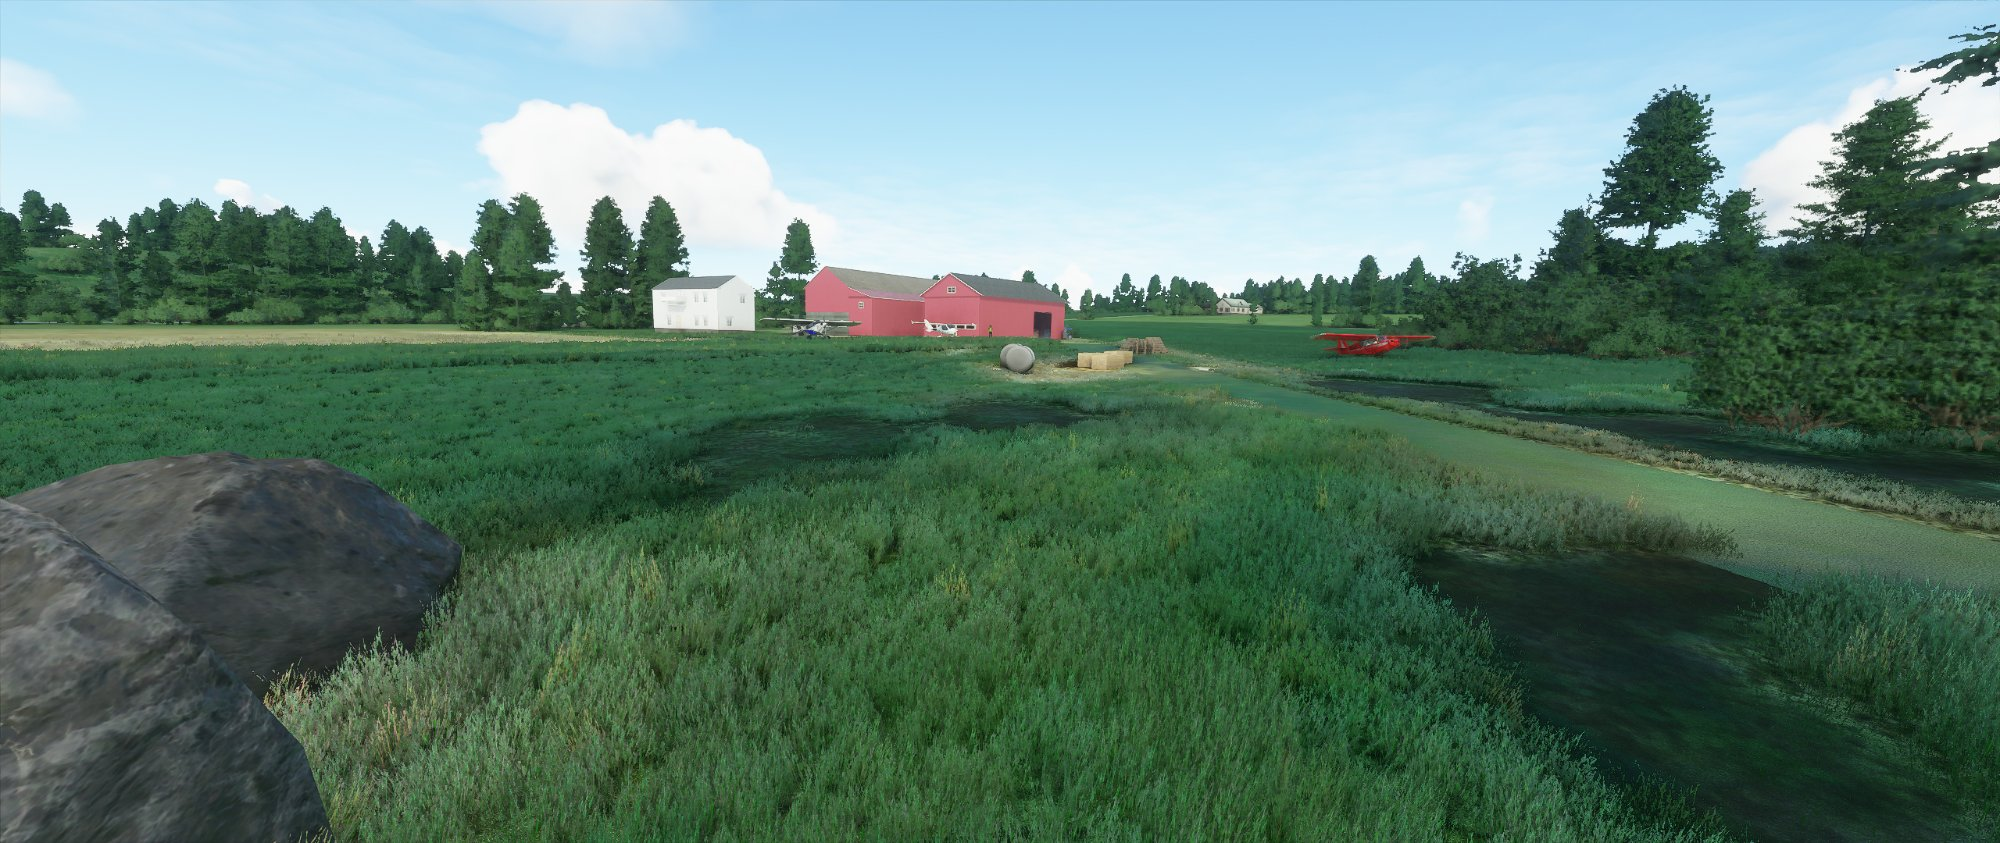 Microsoft Flight Simulator Screenshot 2020.09.24 - 13.45.22.32.jpg